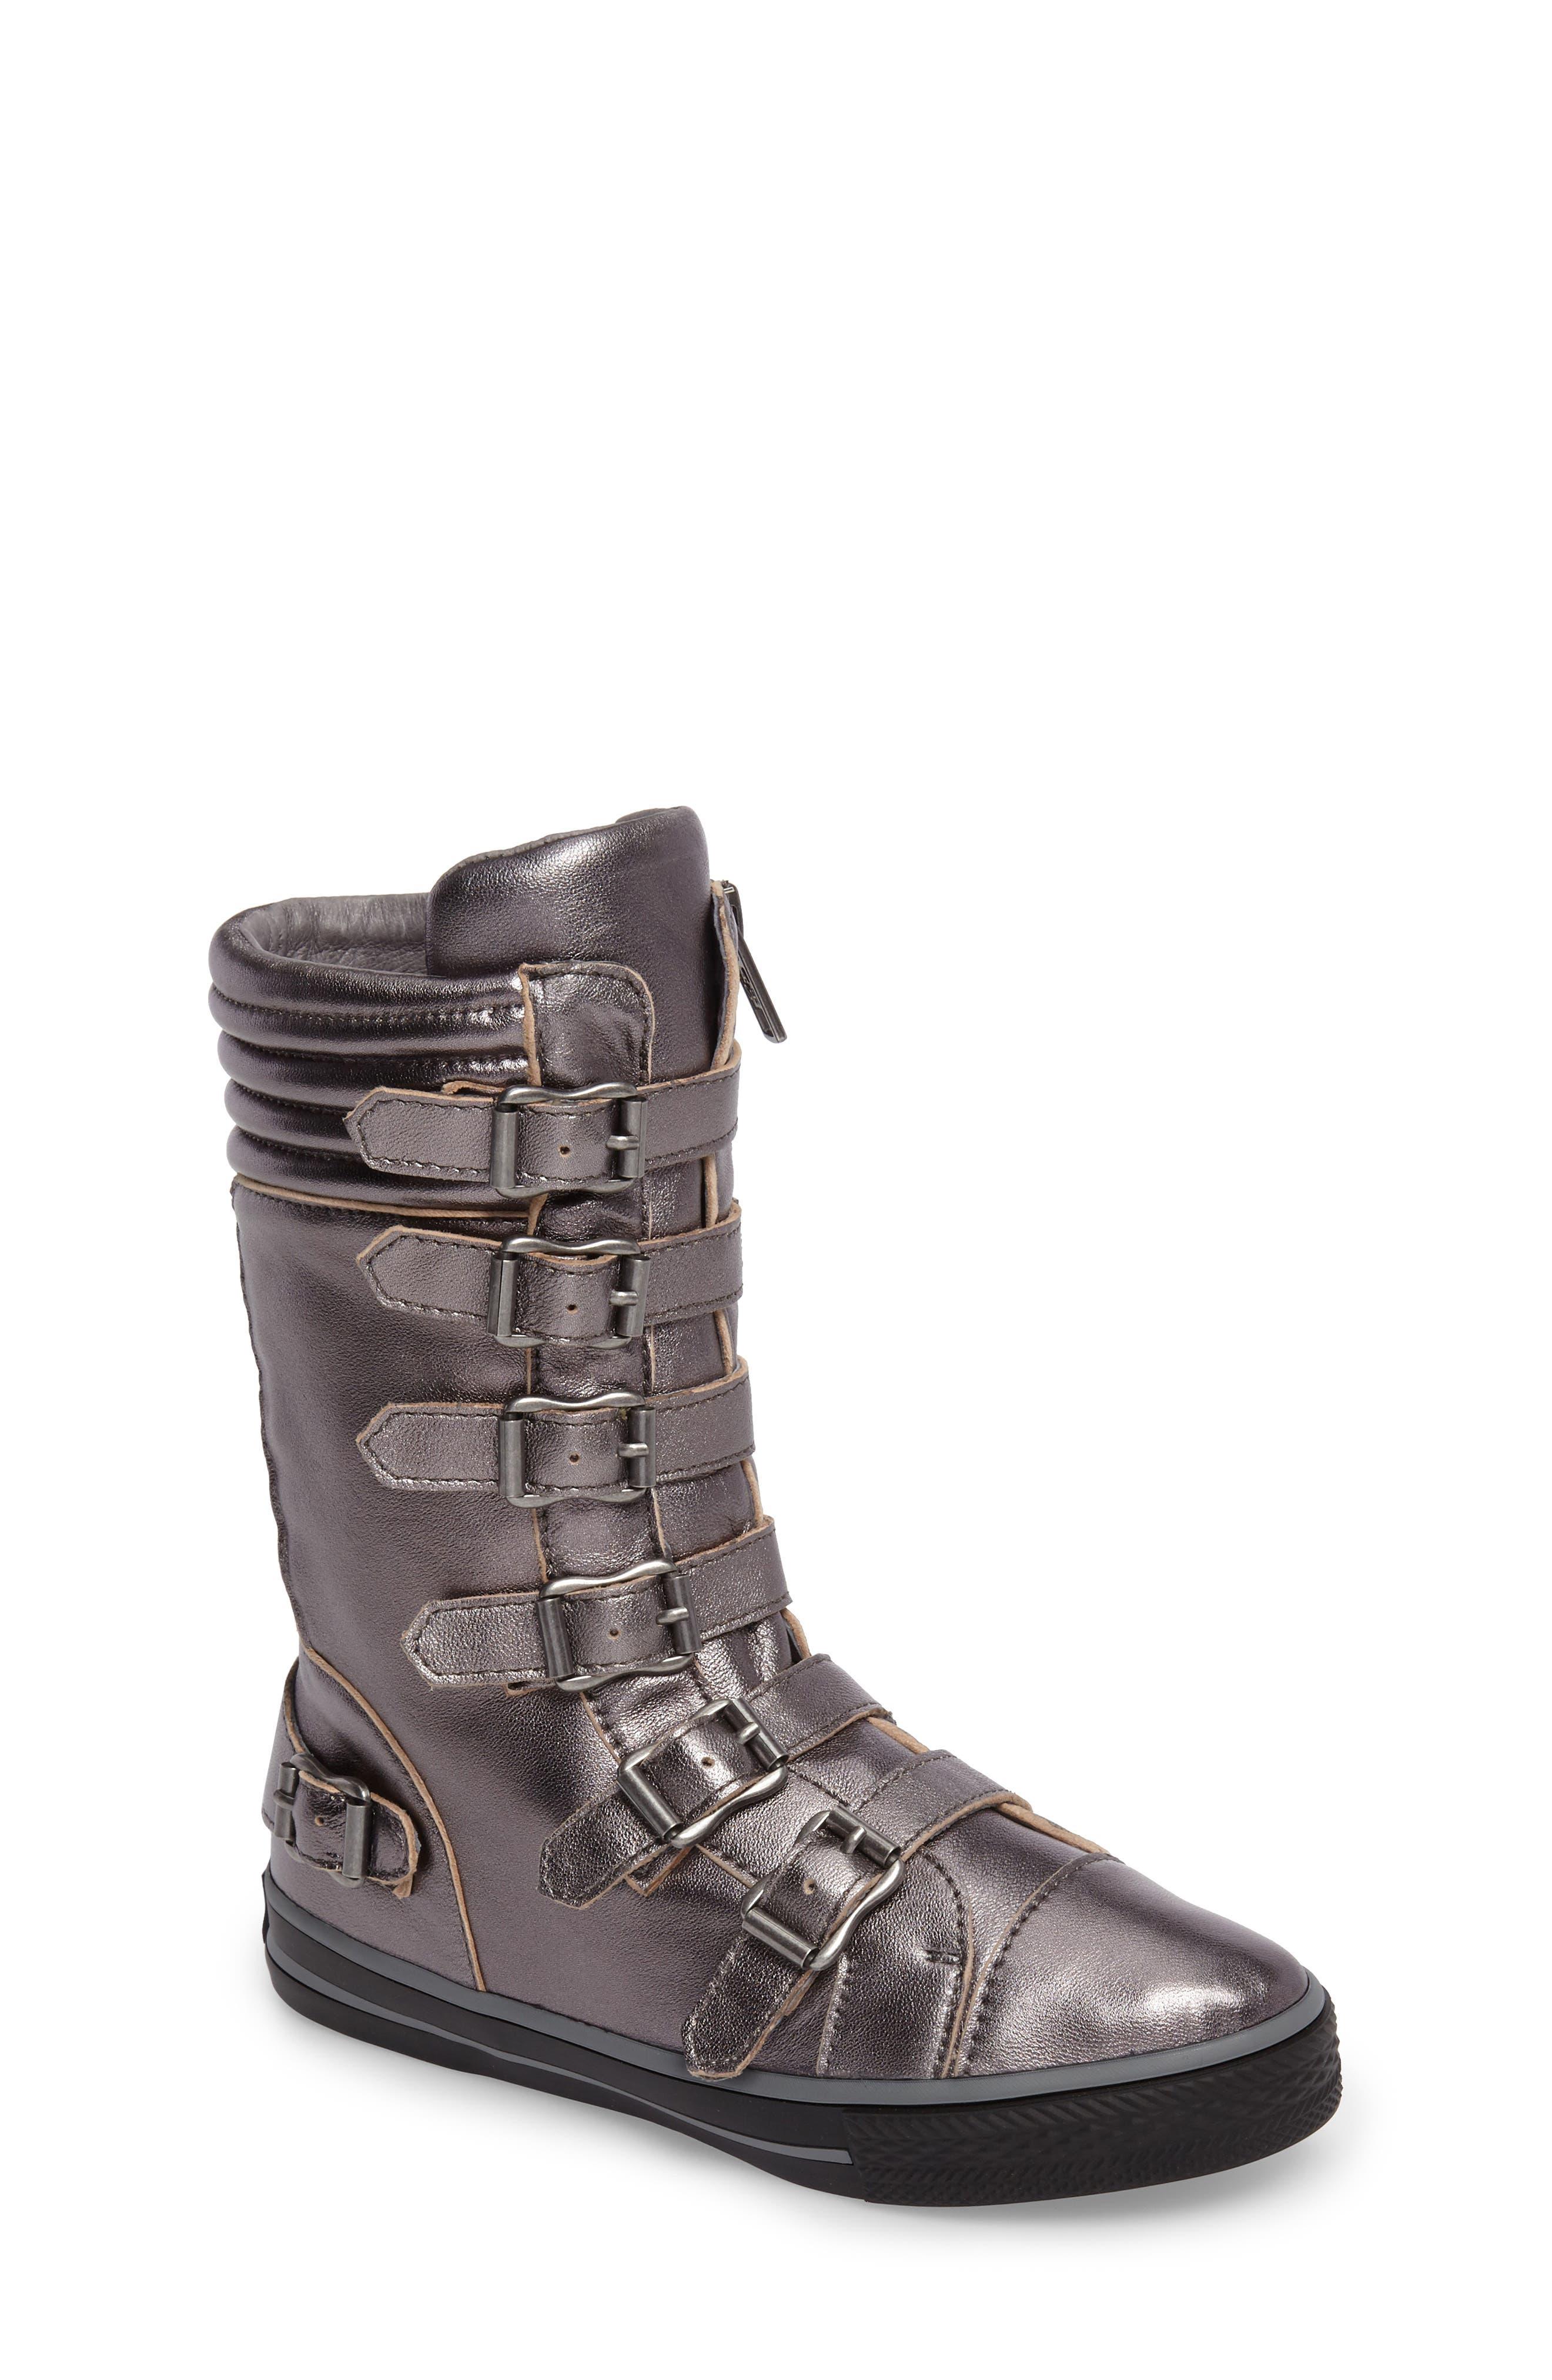 Ash Vava Natalie Tall Sneaker Boot (Toddler, Little Kid & Big Kid)